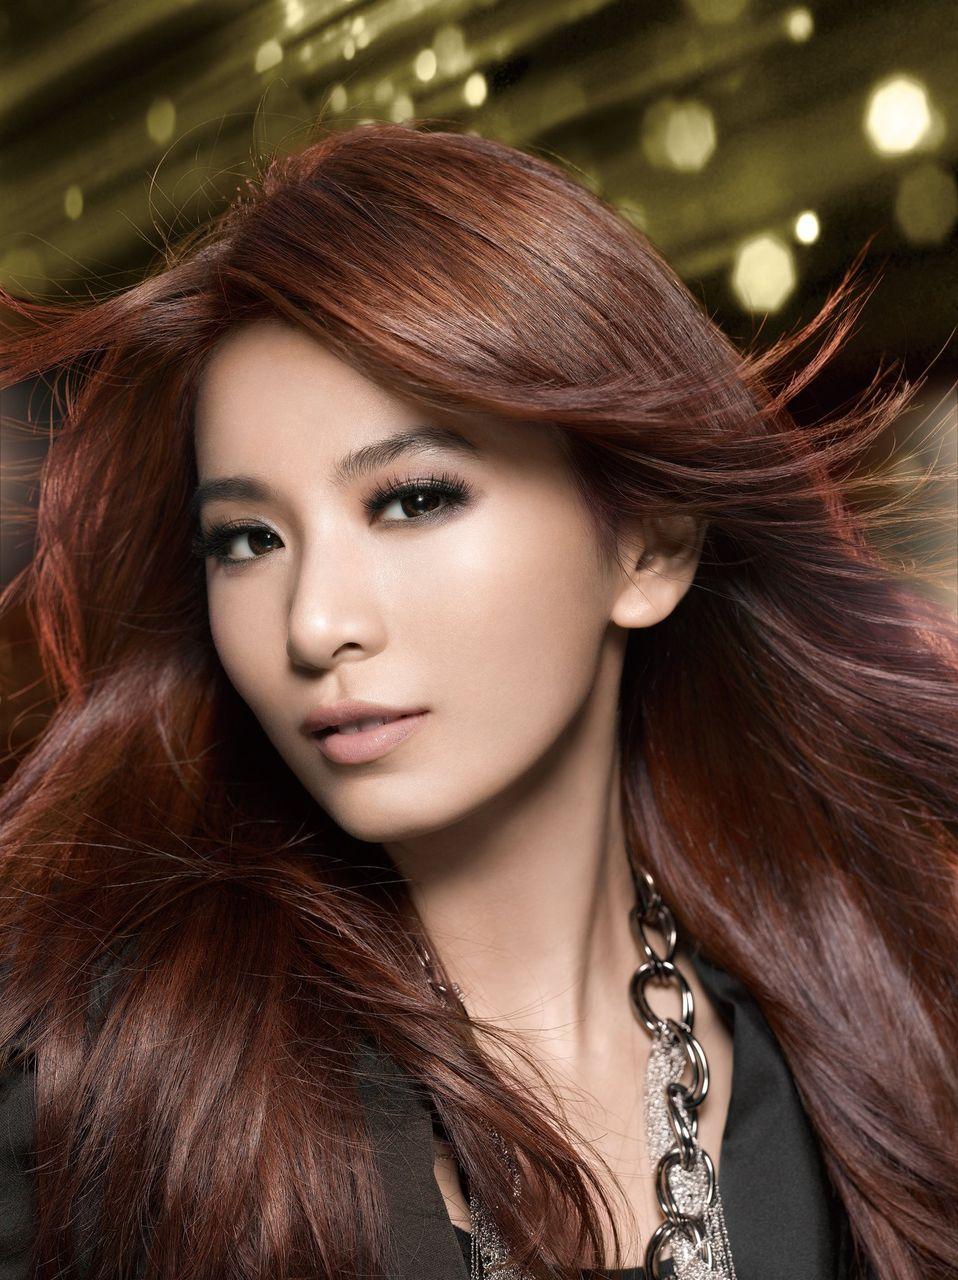 K Chen L Chle iluvella chen jia hua hebe pics l 39 oreal endorsement pics